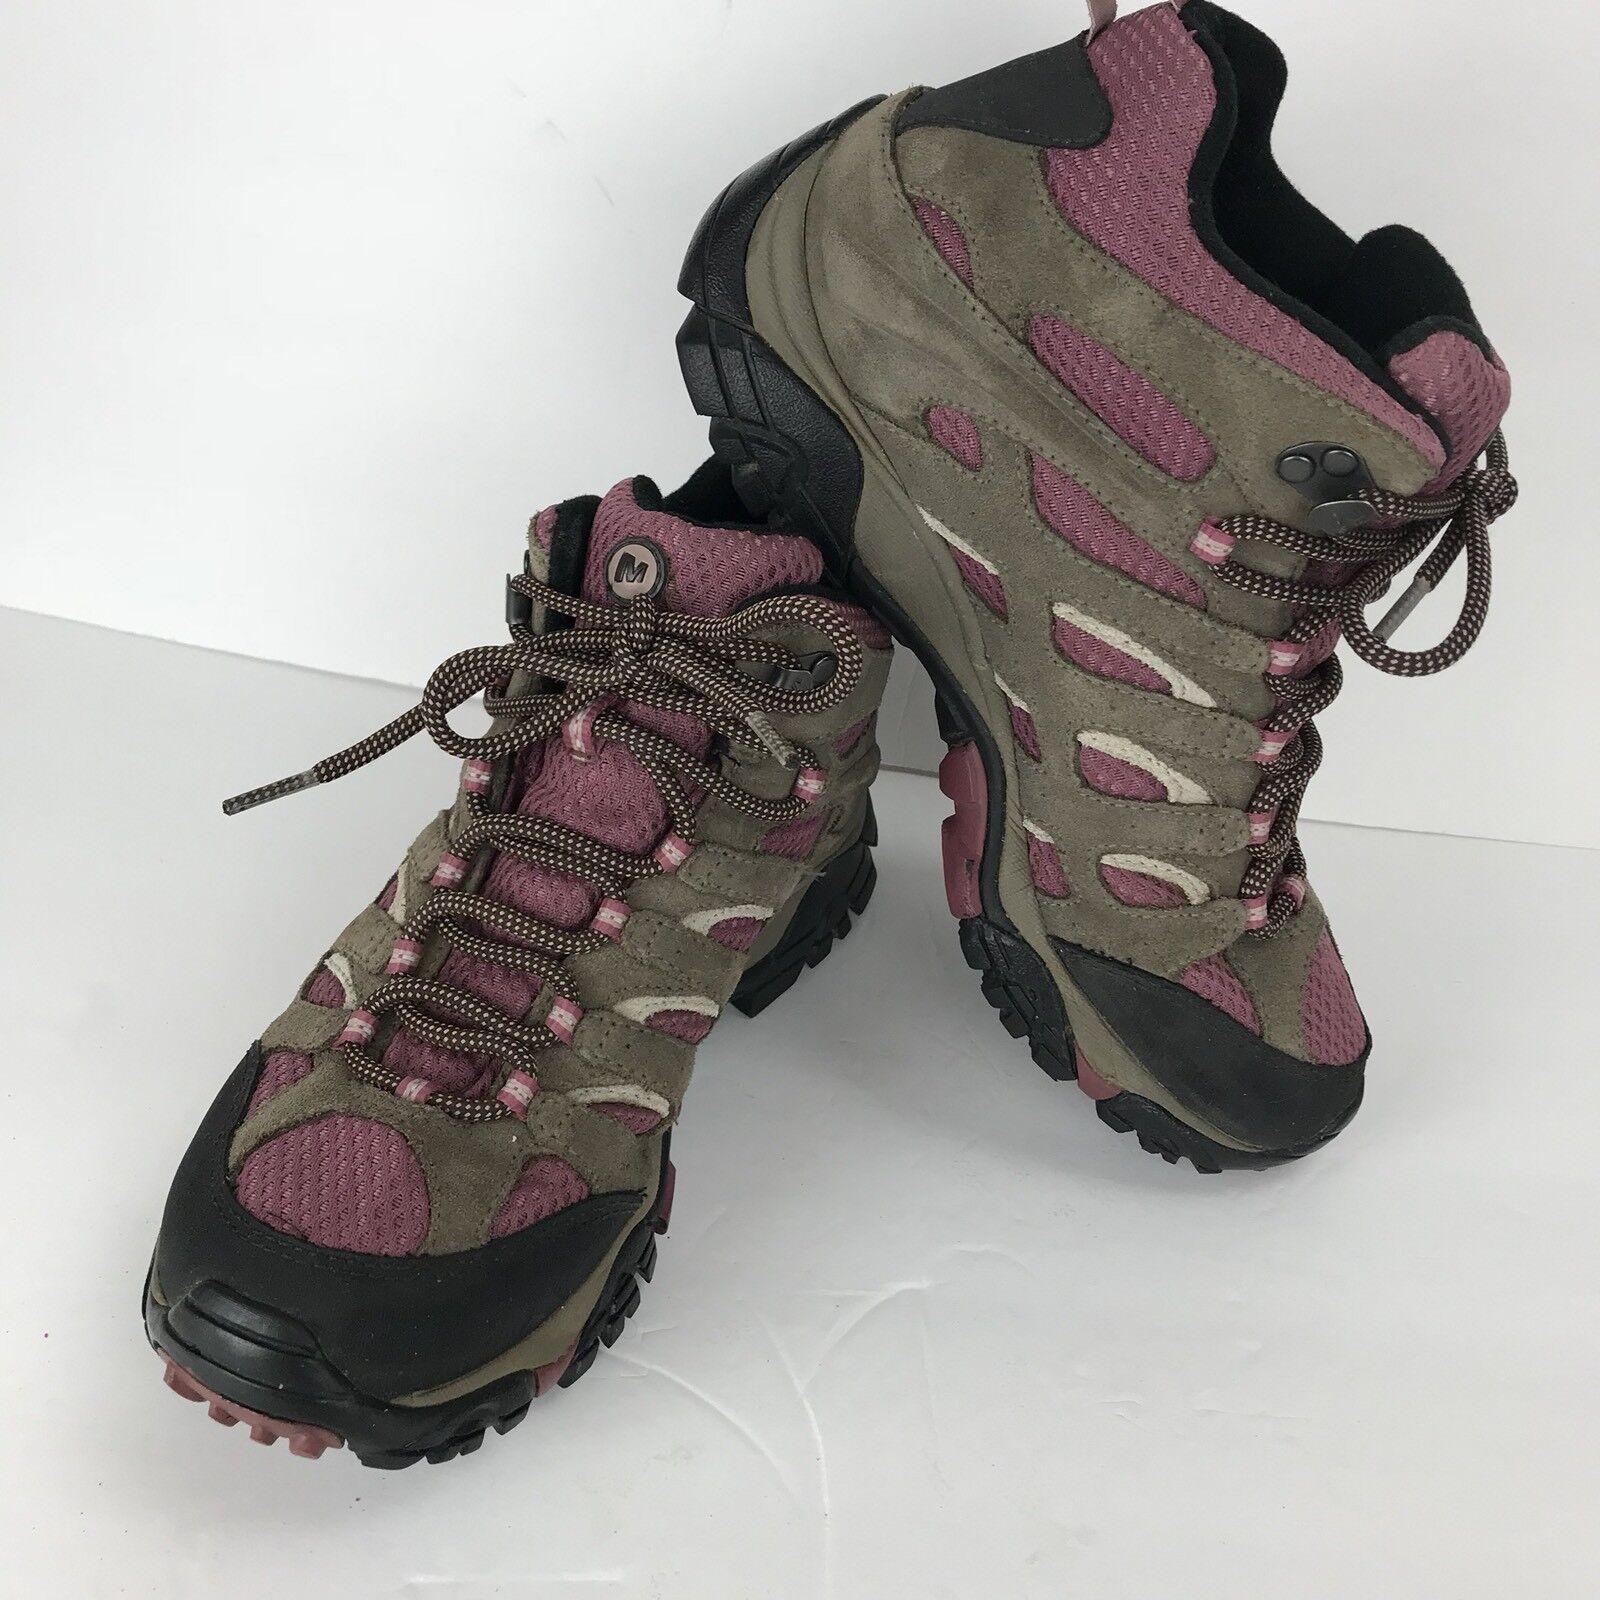 Merrell Hiking Walking Schuhes Select Dry Pink Tan Lace Up Damens Größe 8 Gore Tek